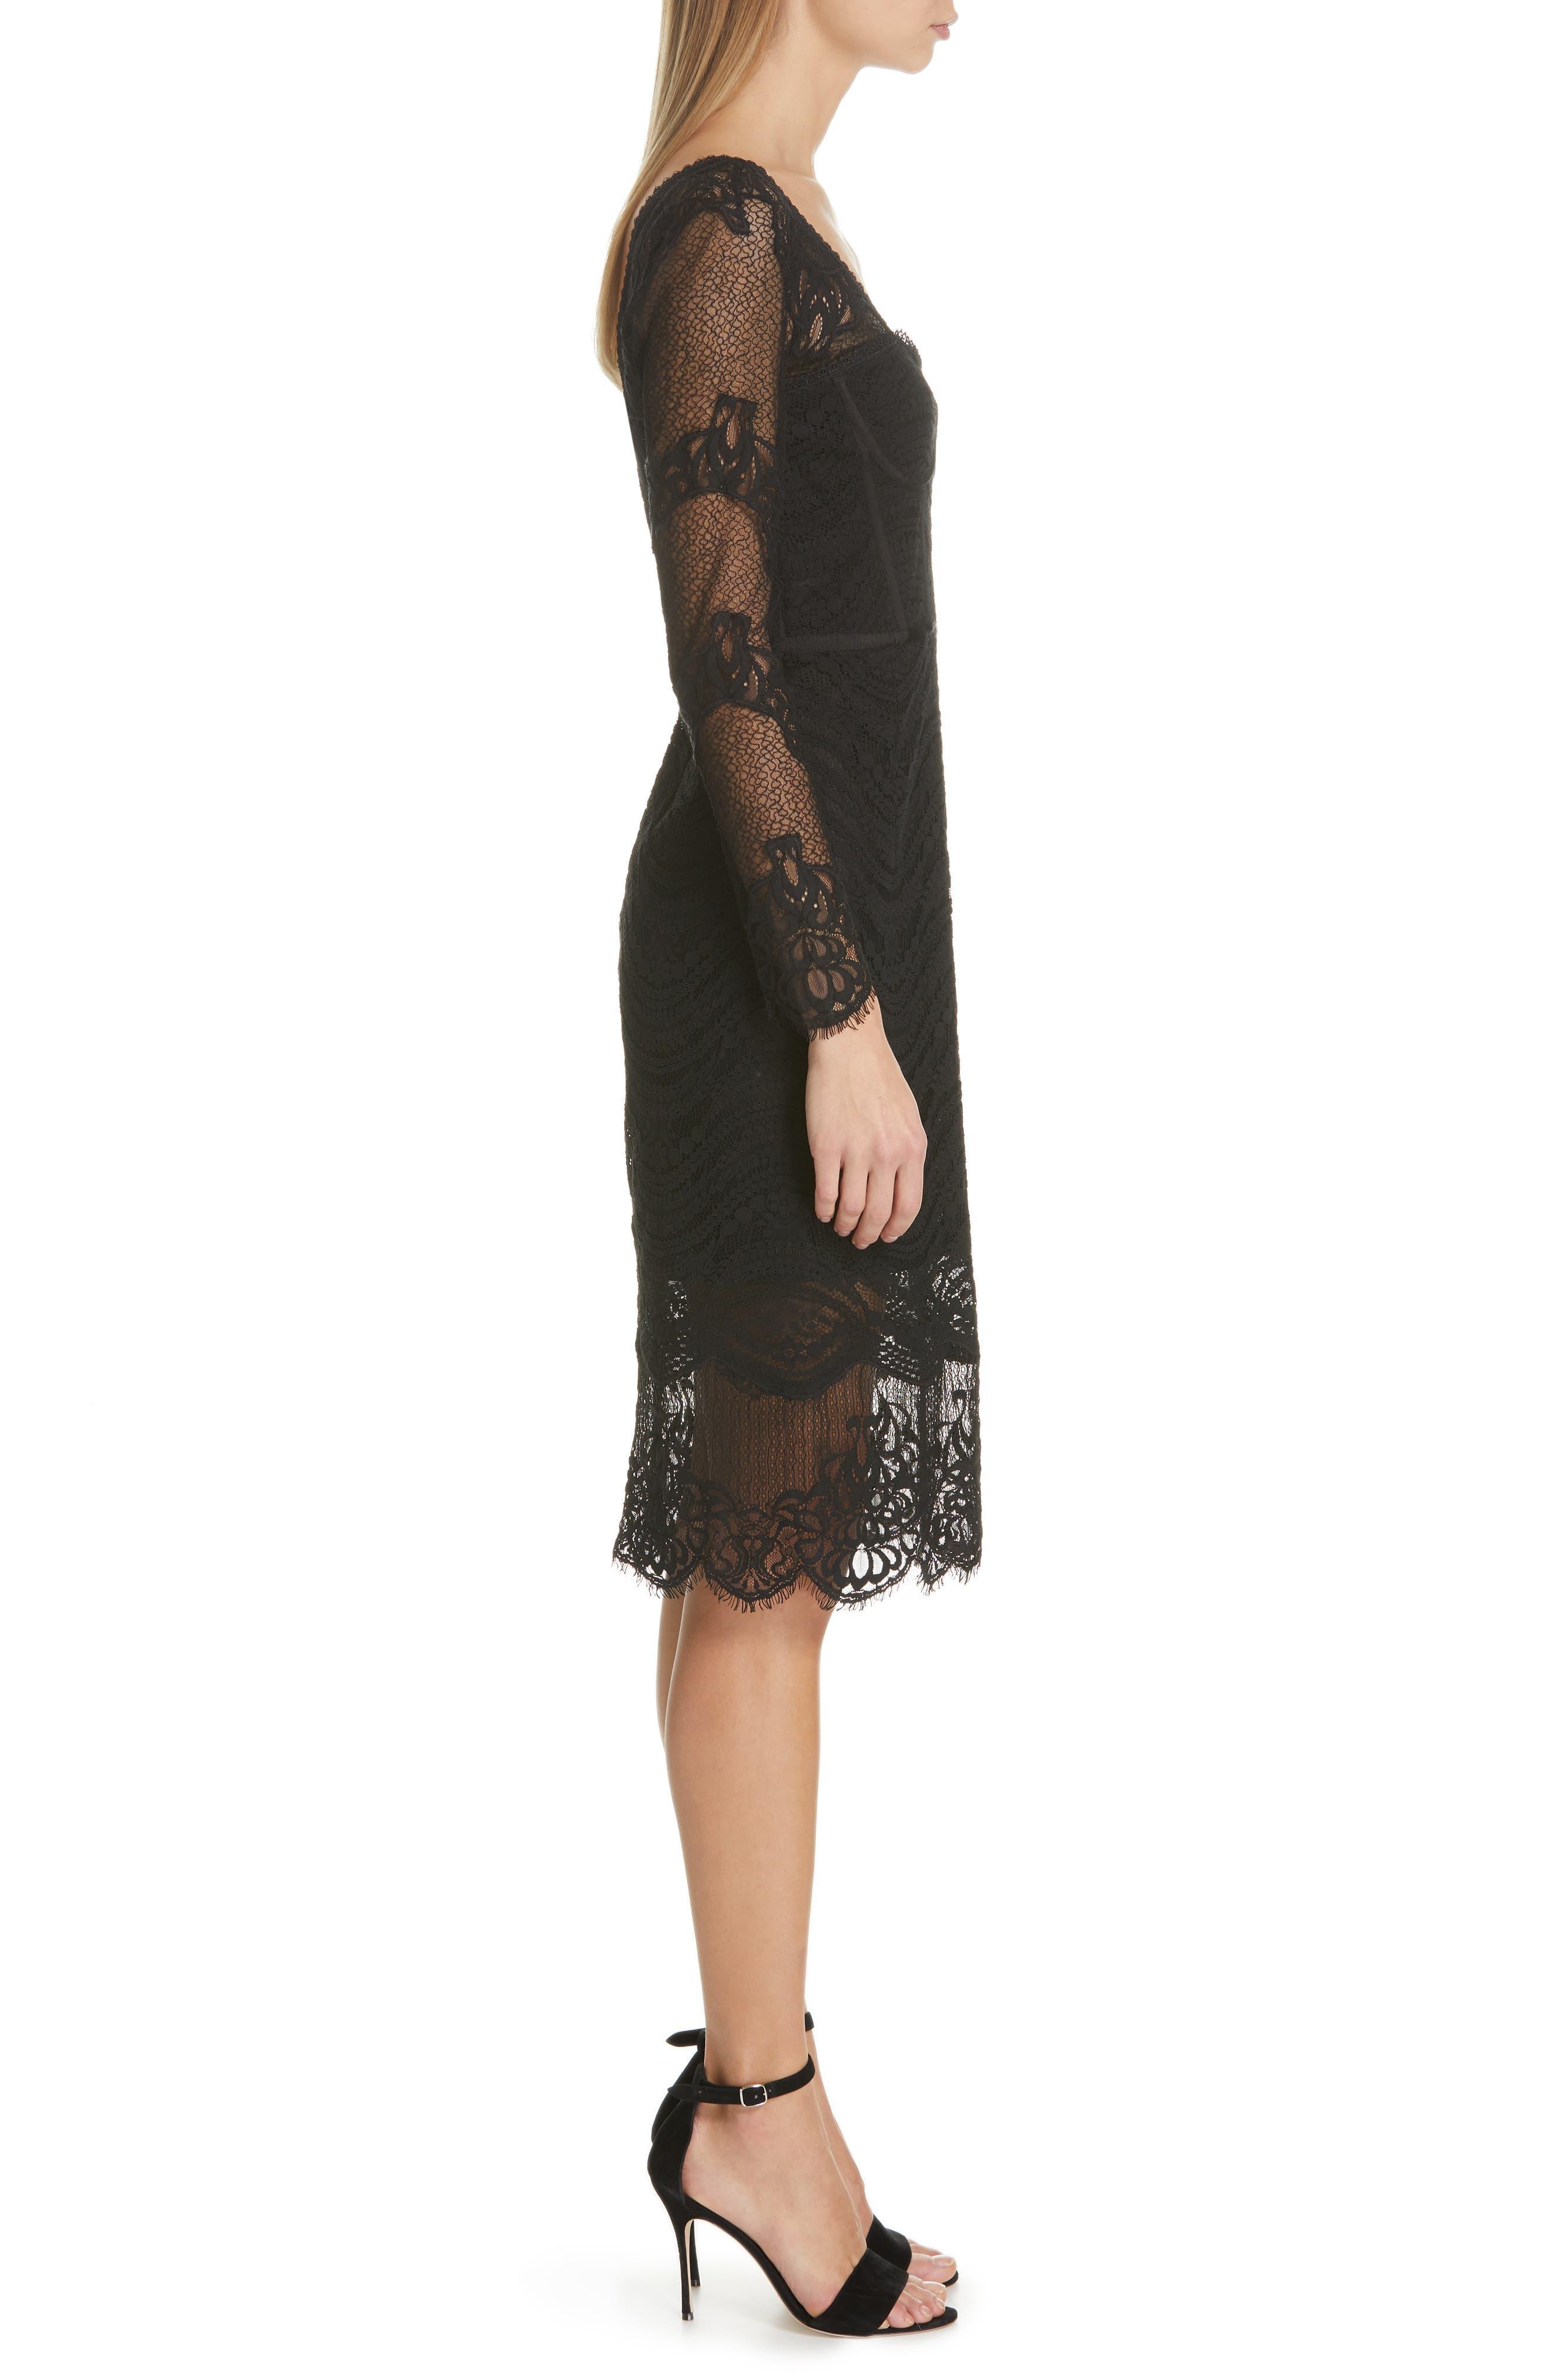 JONATHAN SIMKHAI,                             Lace Bustier Bodysuit Dress,                             Alternate thumbnail 3, color,                             BLACK